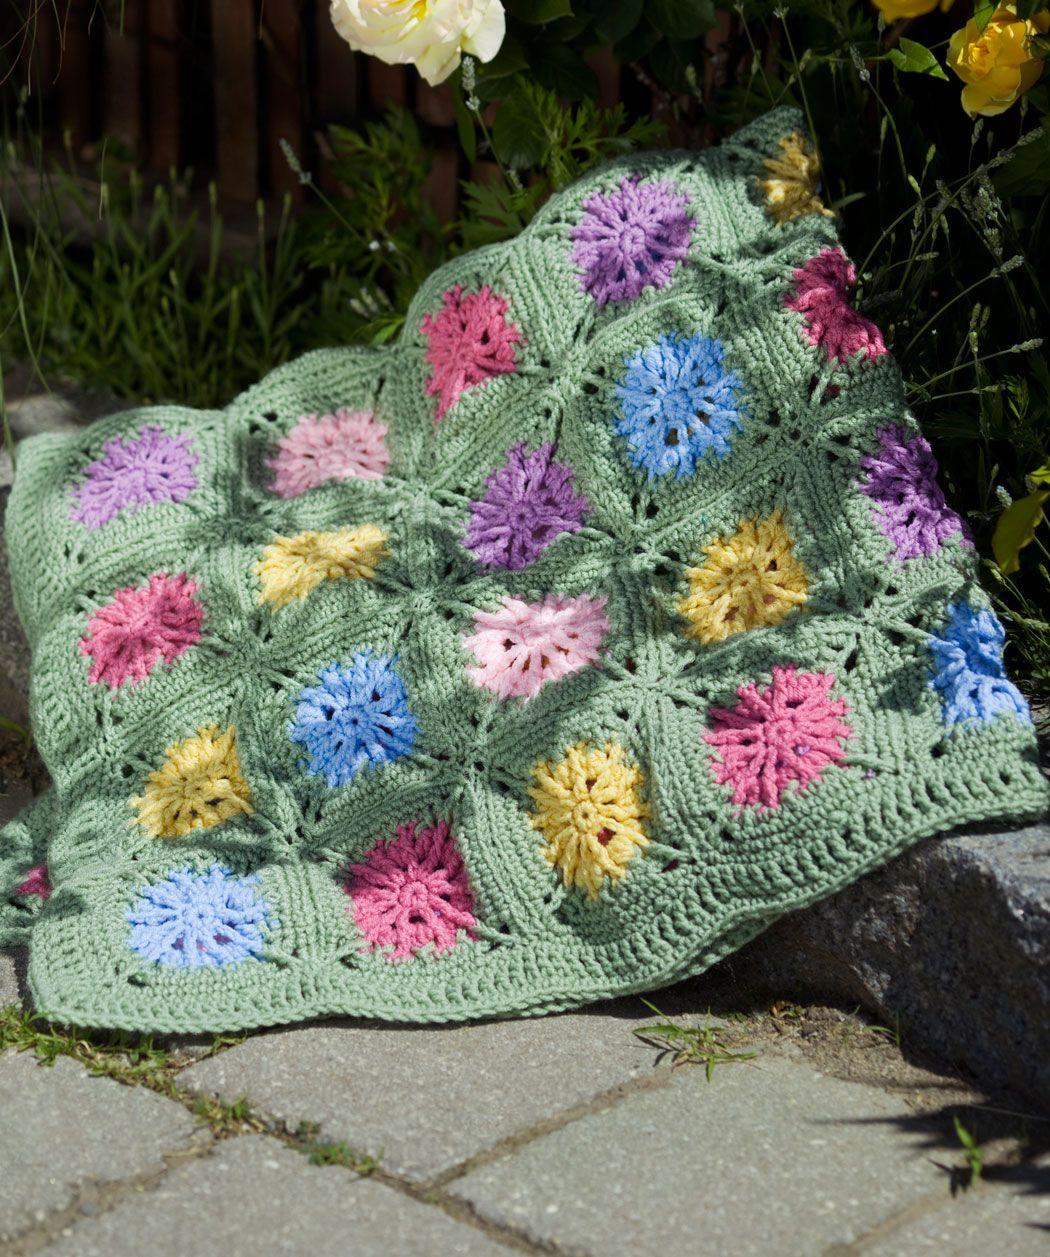 Crochet flower field crochet pattern red heart tejidos - Mantas de ganchillo faciles ...